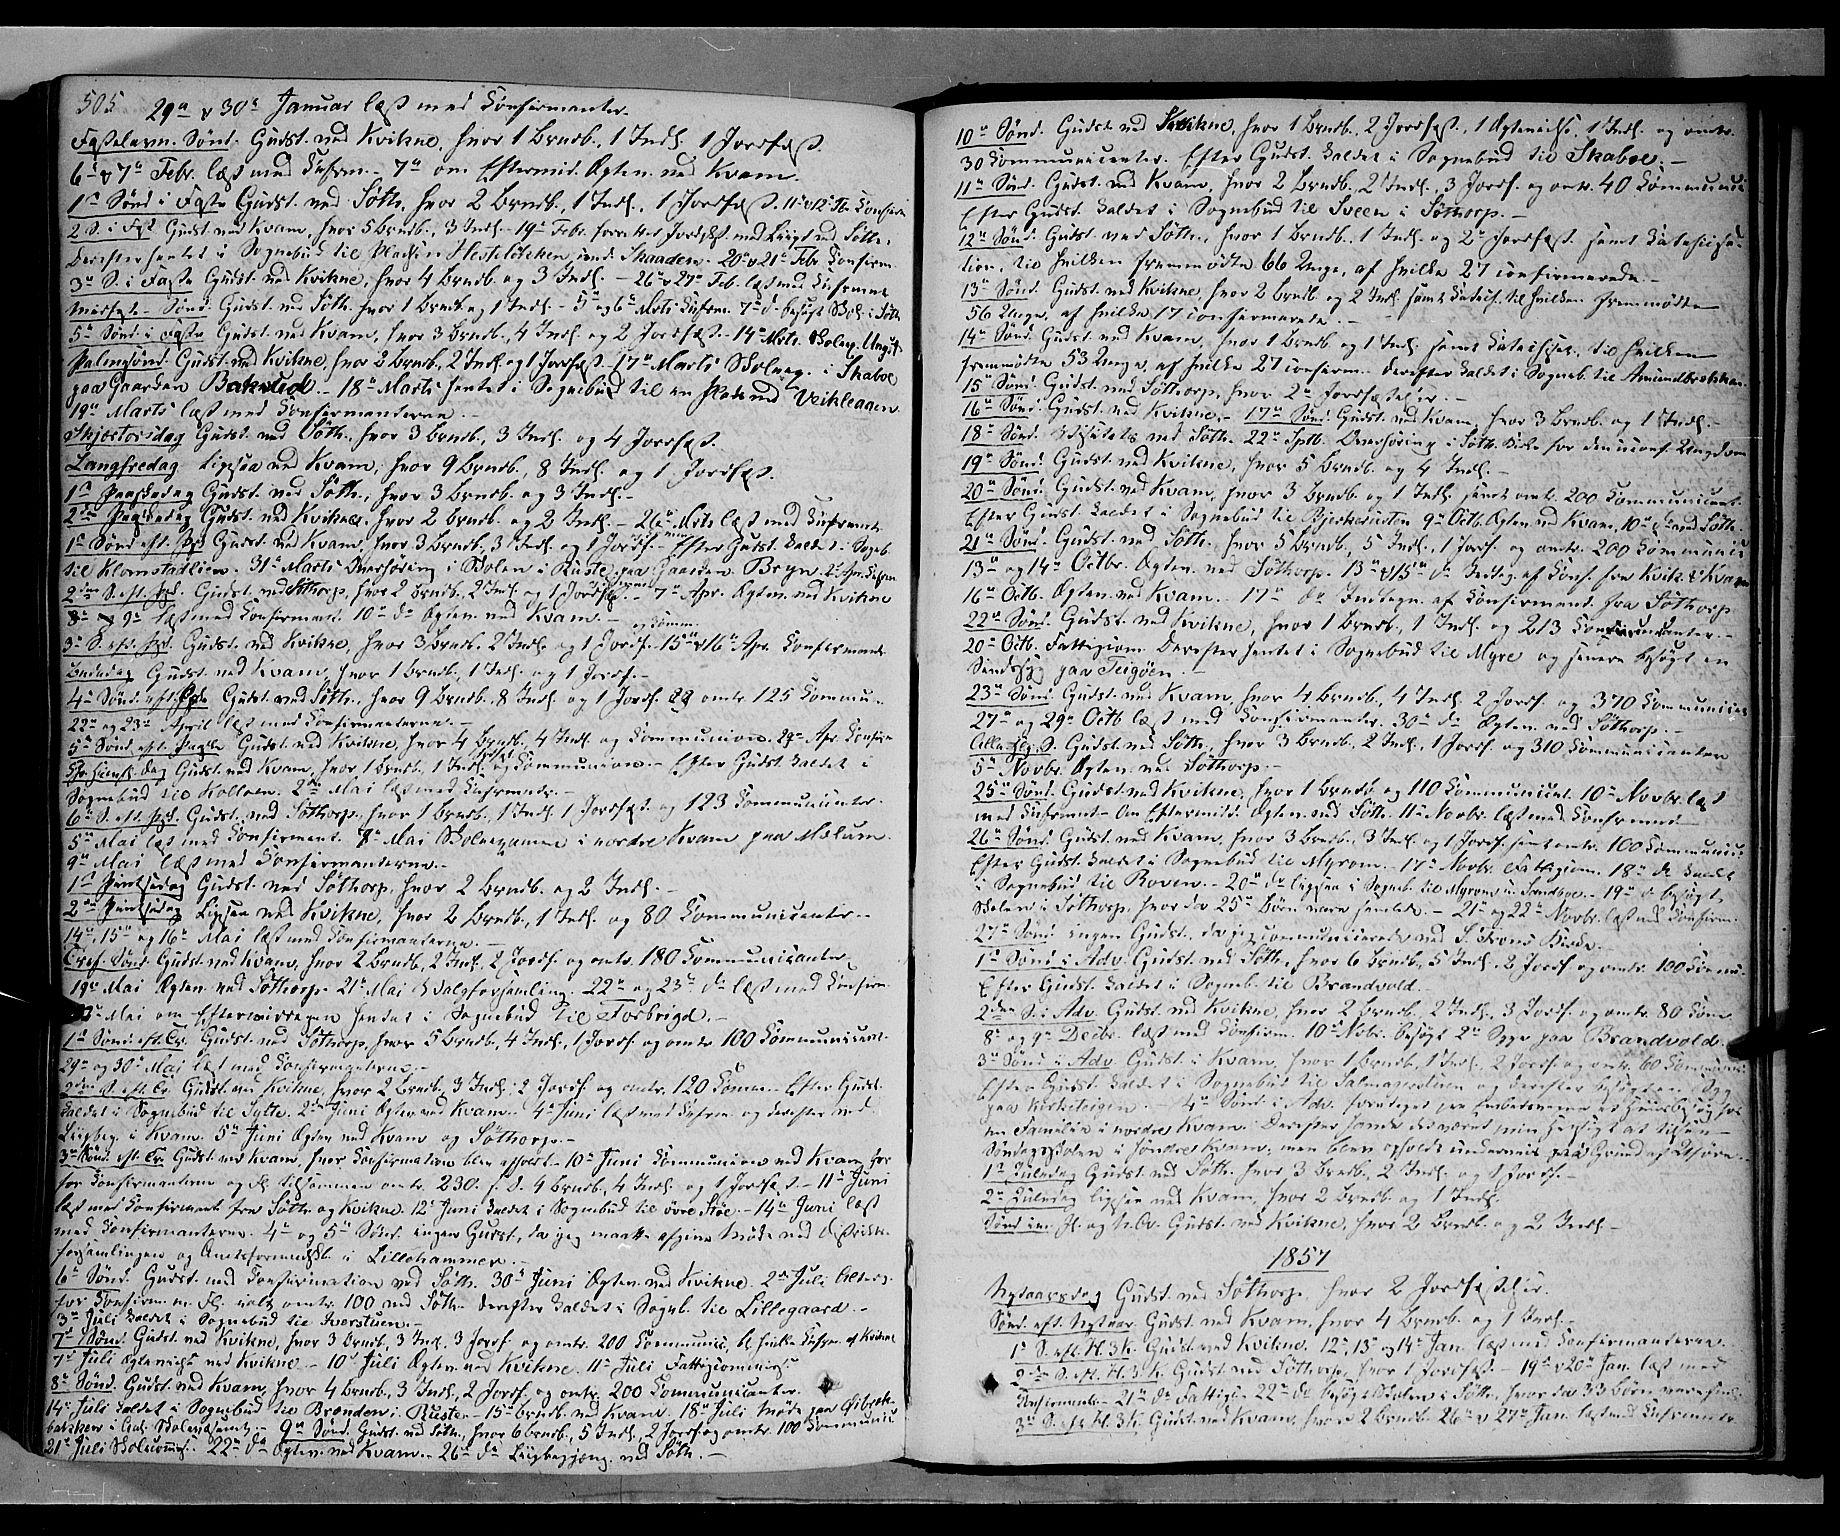 SAH, Nord-Fron prestekontor, Ministerialbok nr. 1, 1851-1864, s. 505